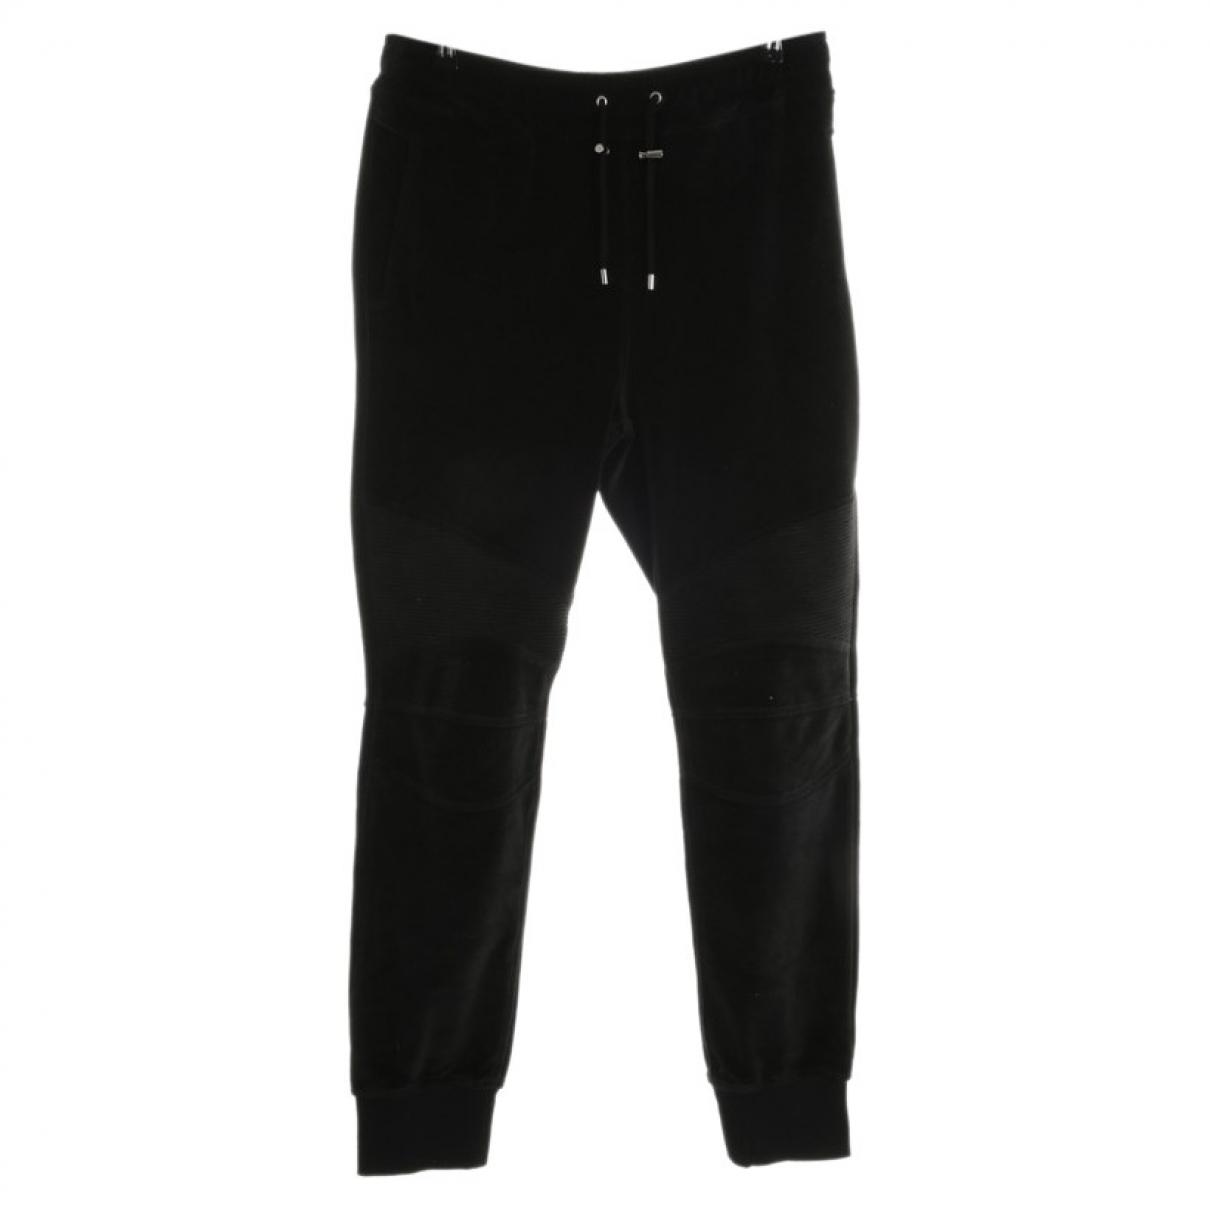 Pantalon en Algodon Negro Balmain